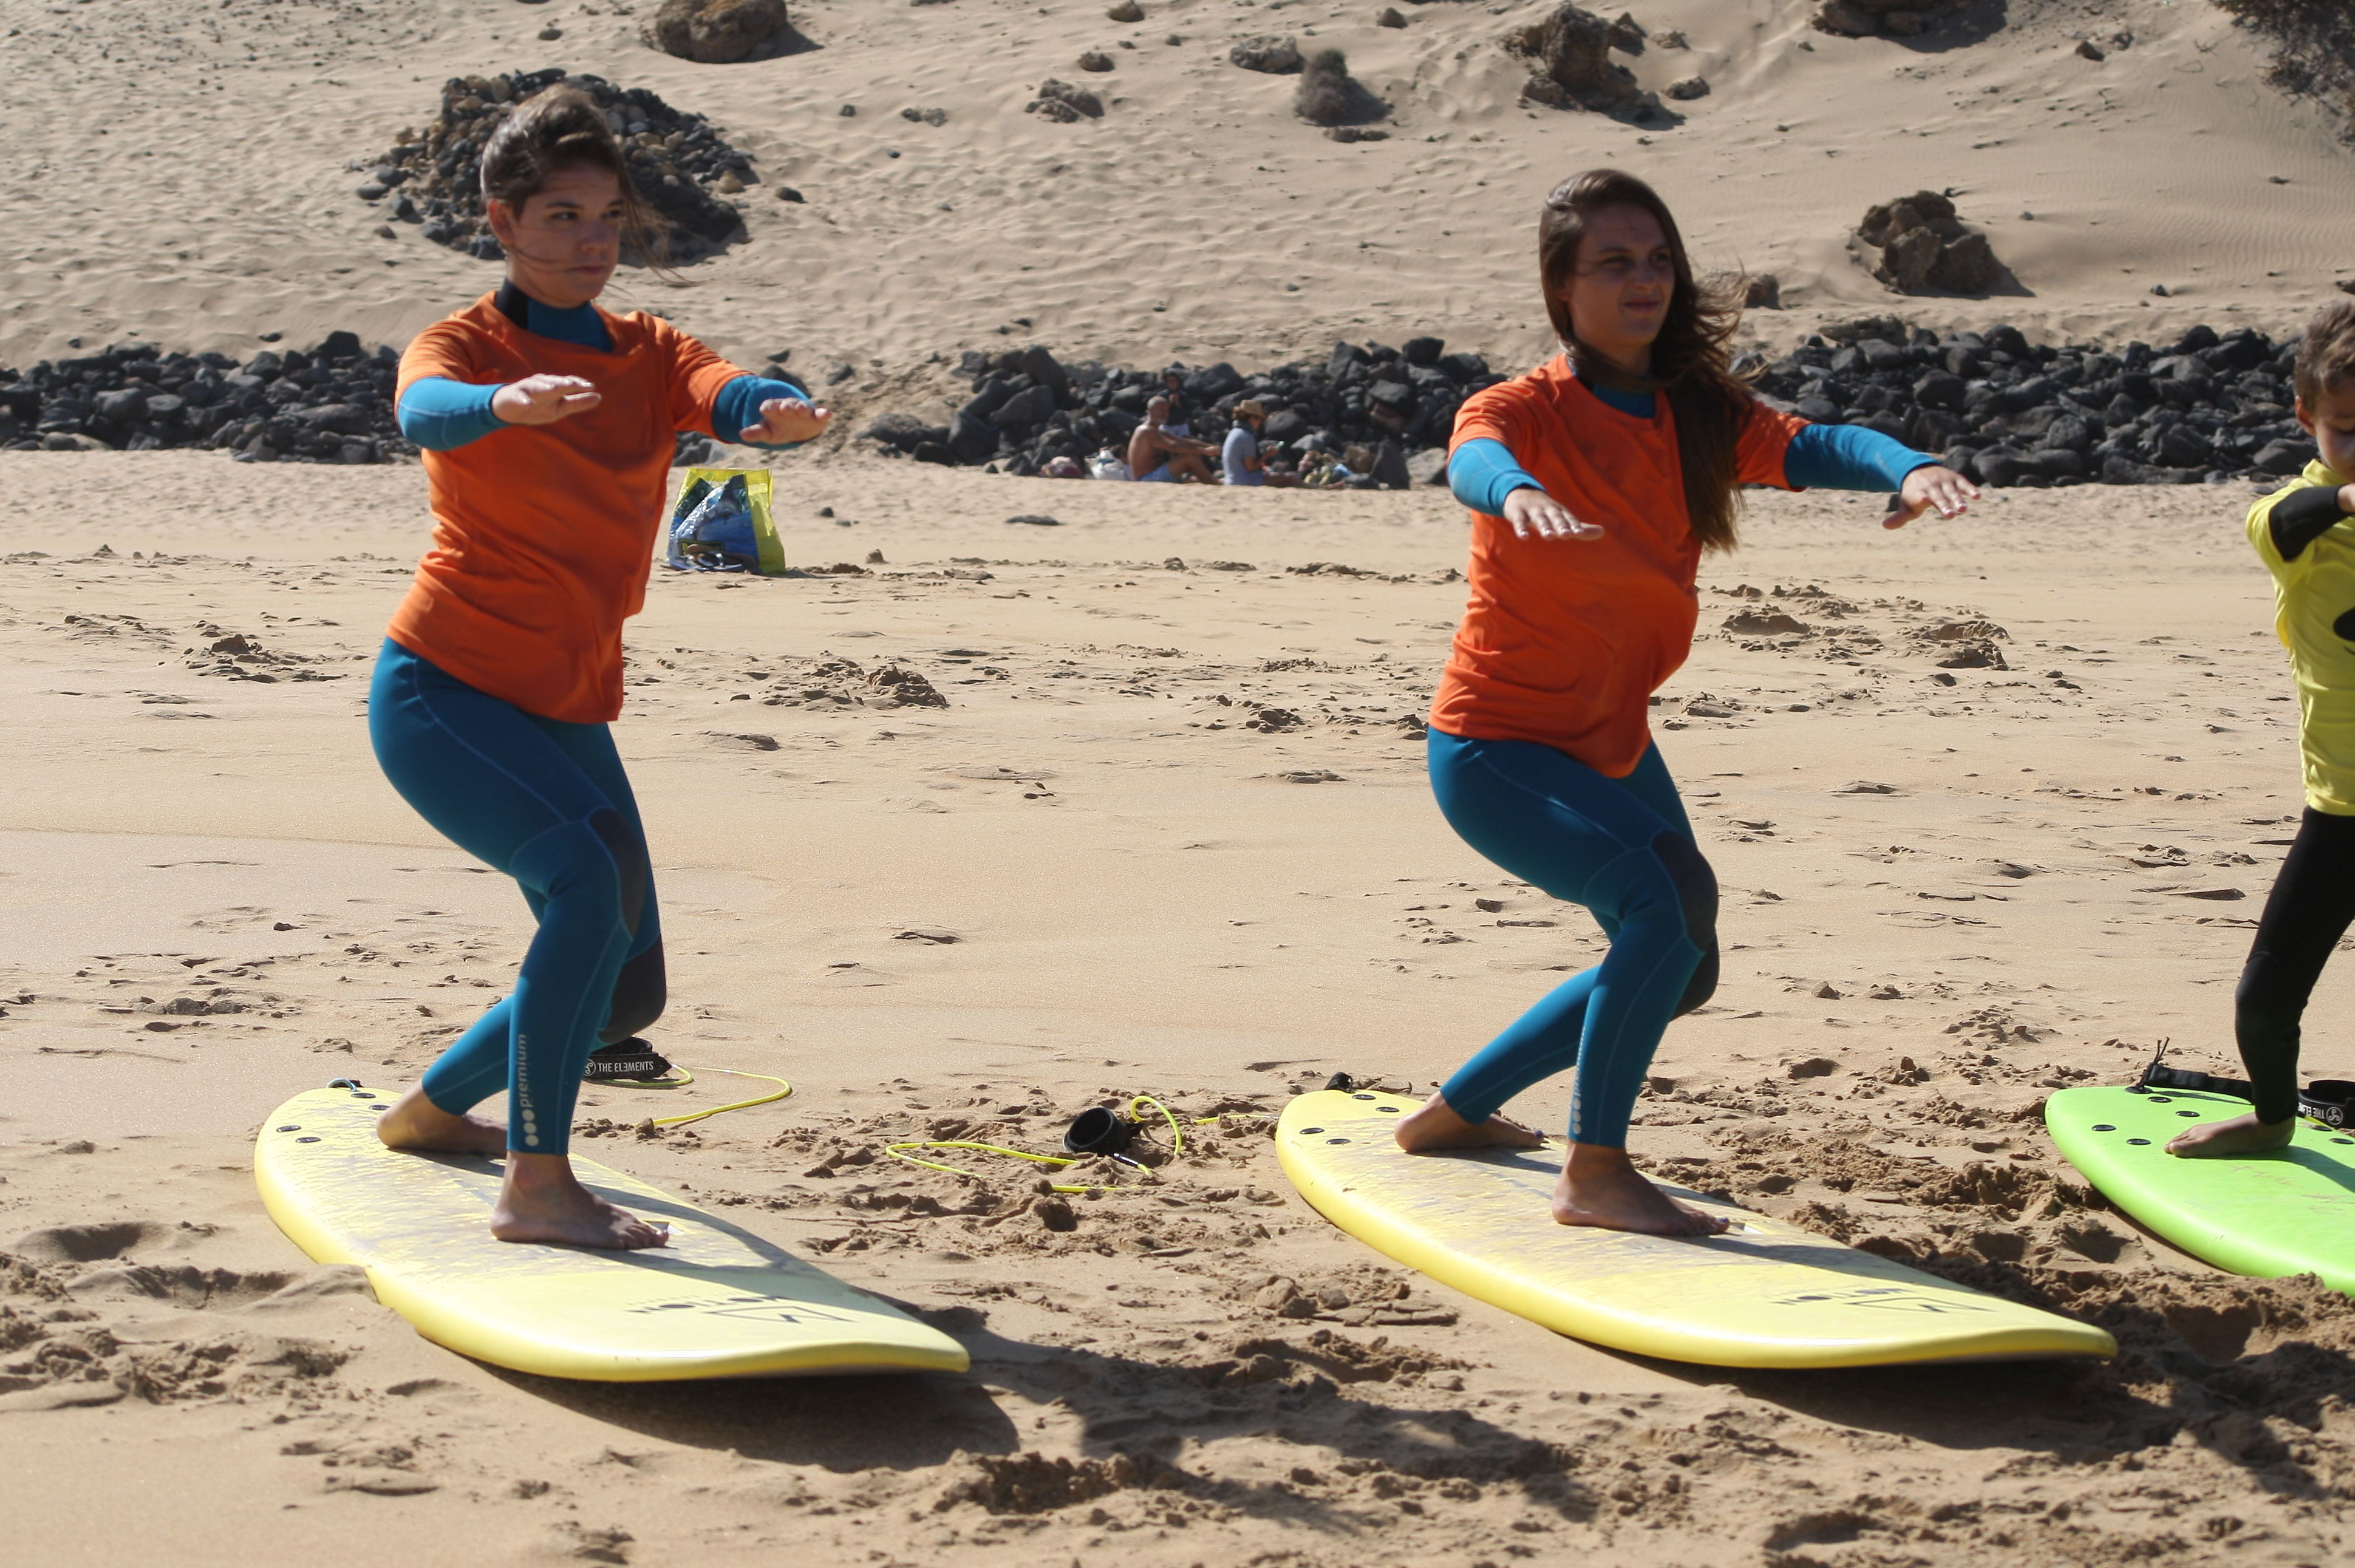 Foto 4 de Surf school en  | Shock Wave Surf School